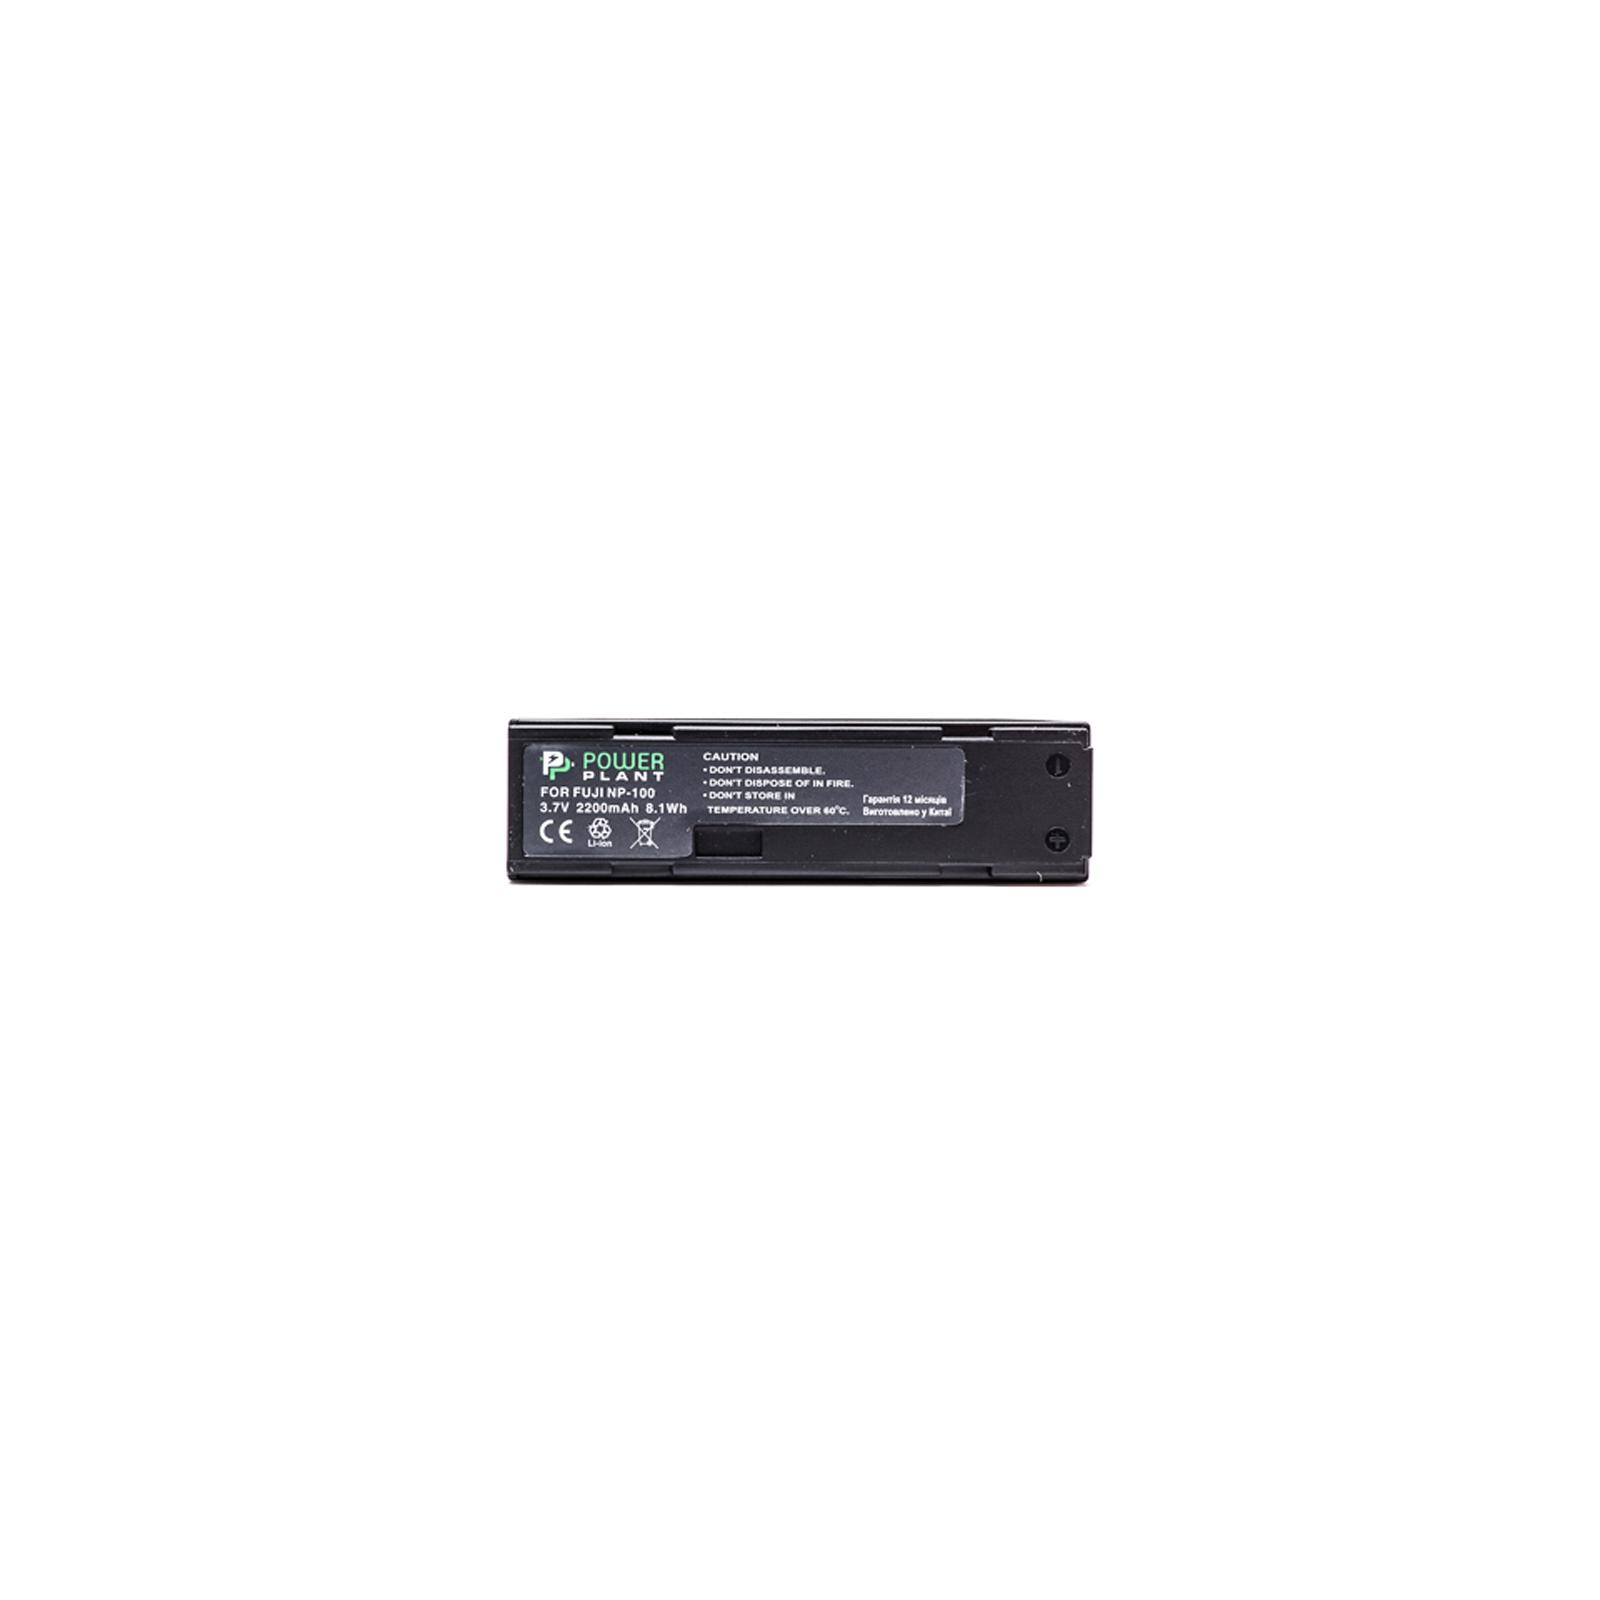 Аккумулятор к фото/видео PowerPlant Fuji NP-100 (DV00DV1049) изображение 2